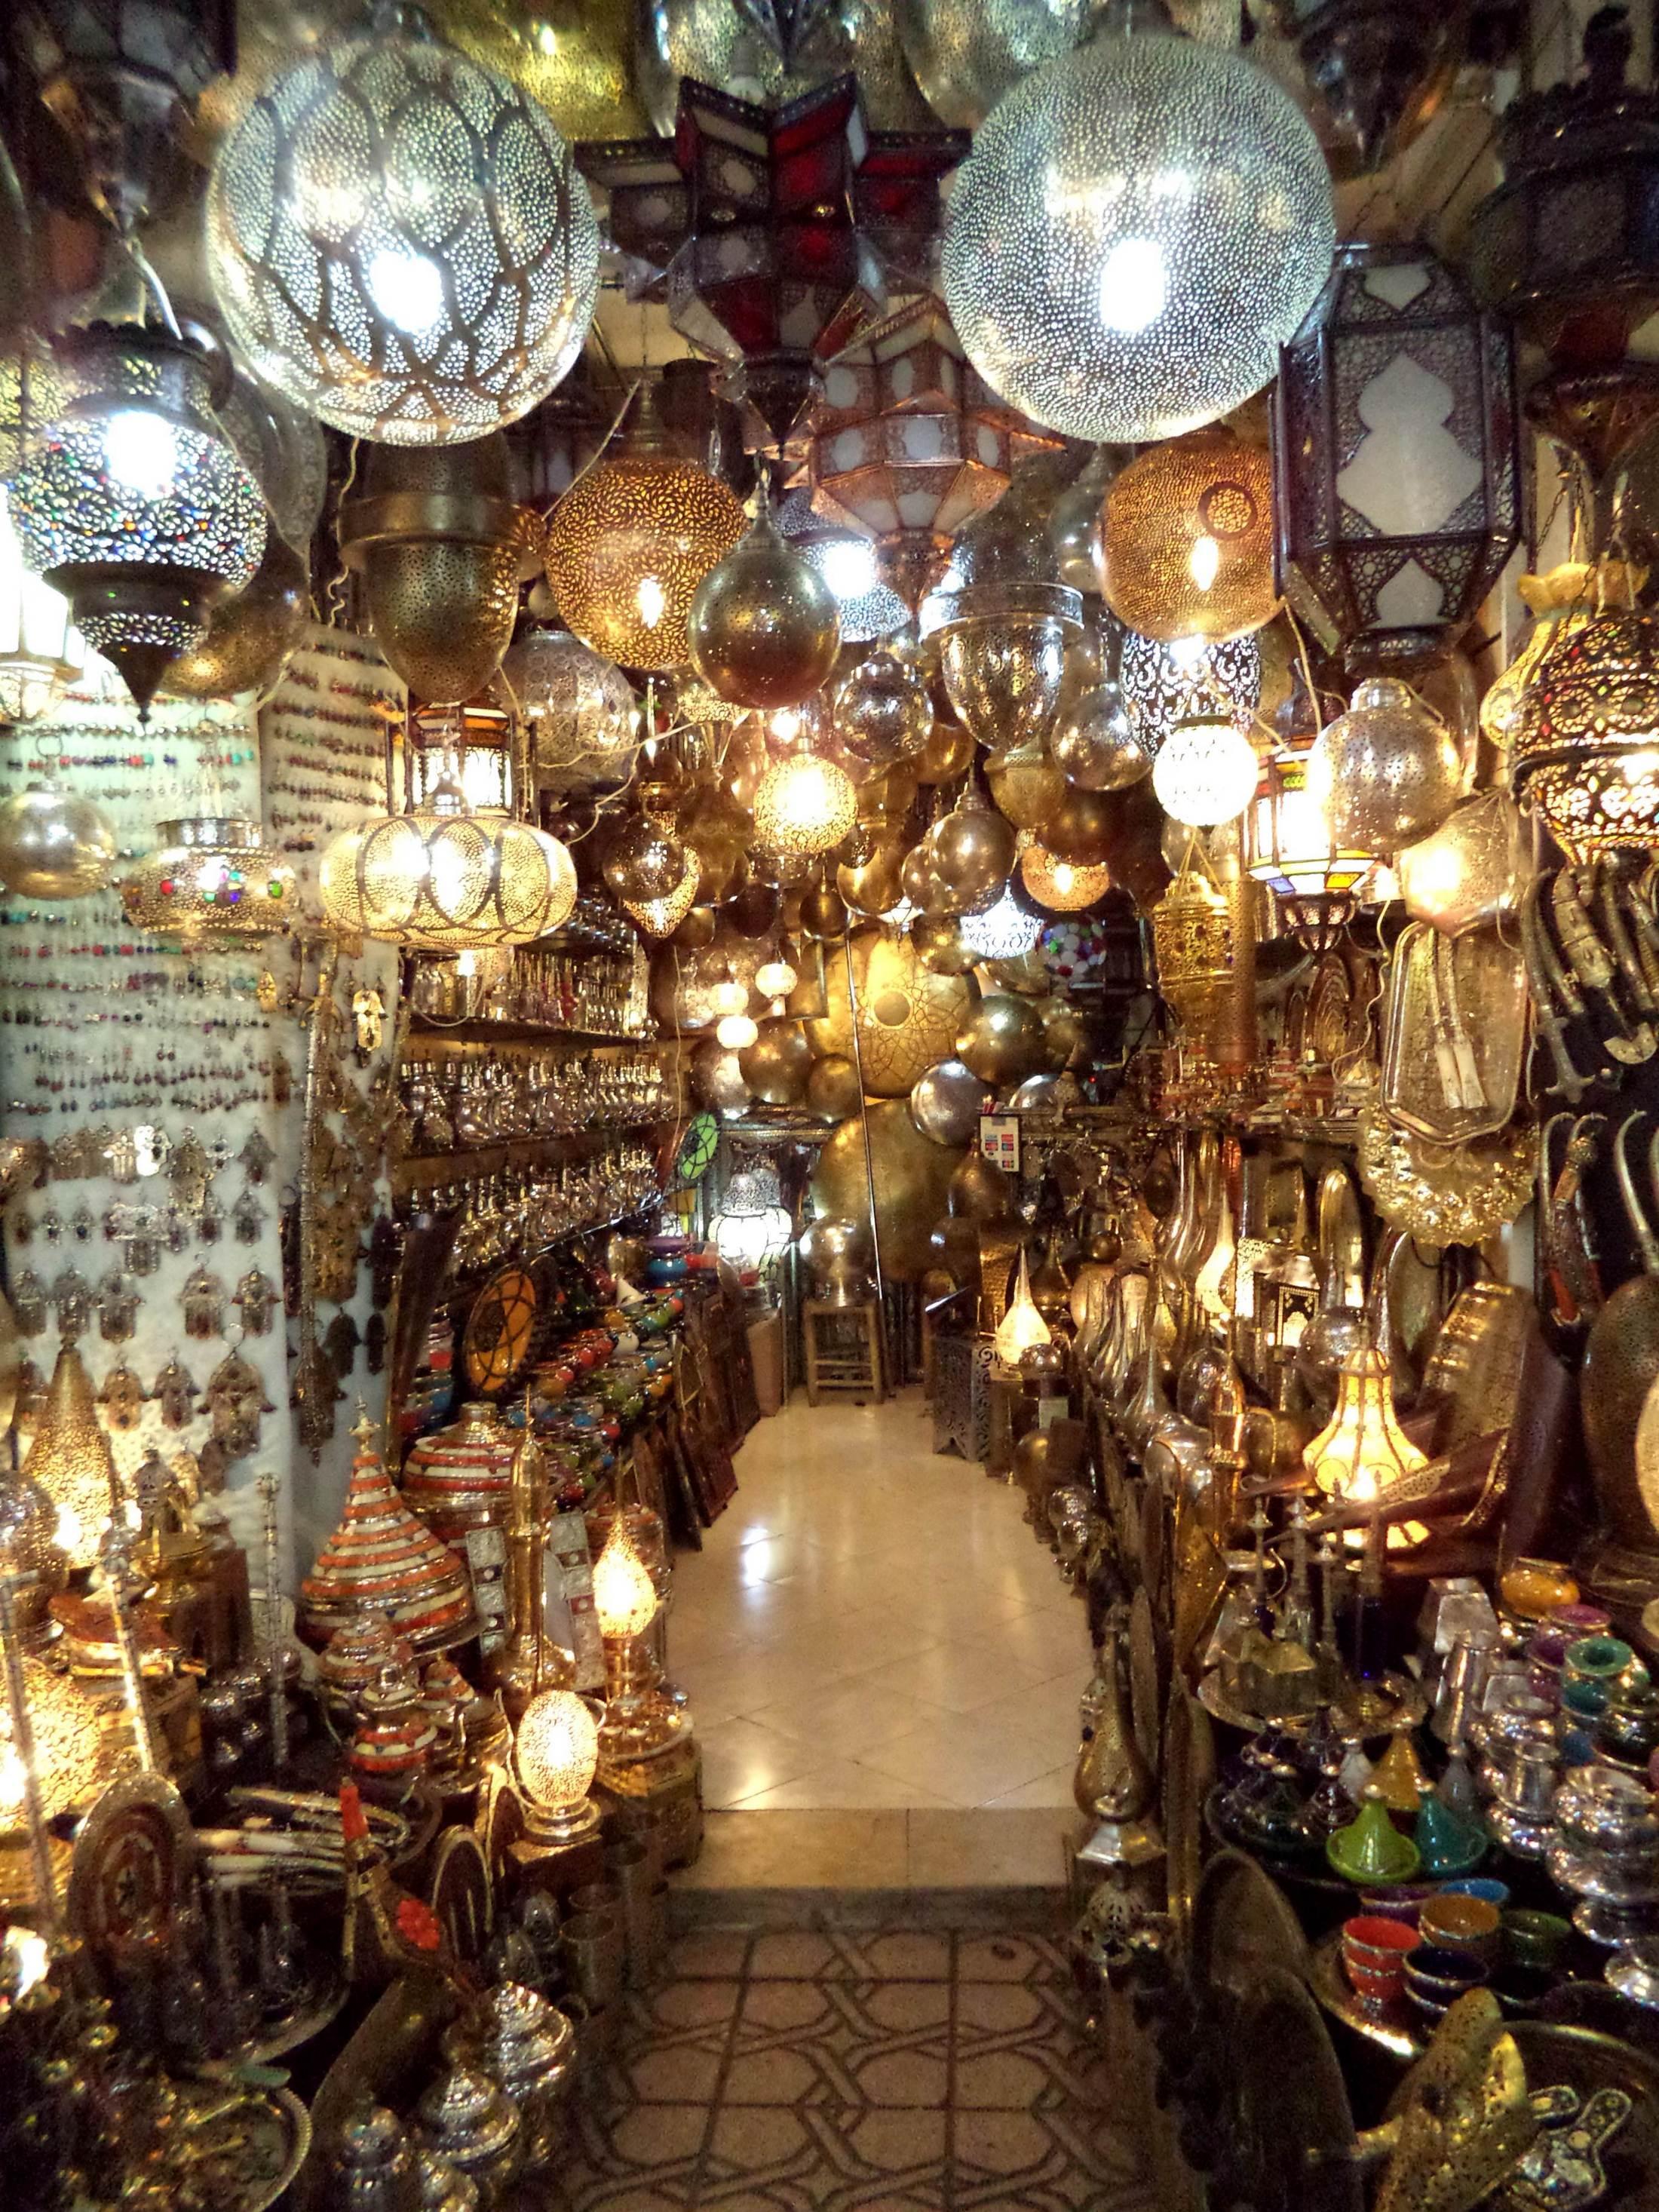 Maroko - wakacje. Suk Bazar